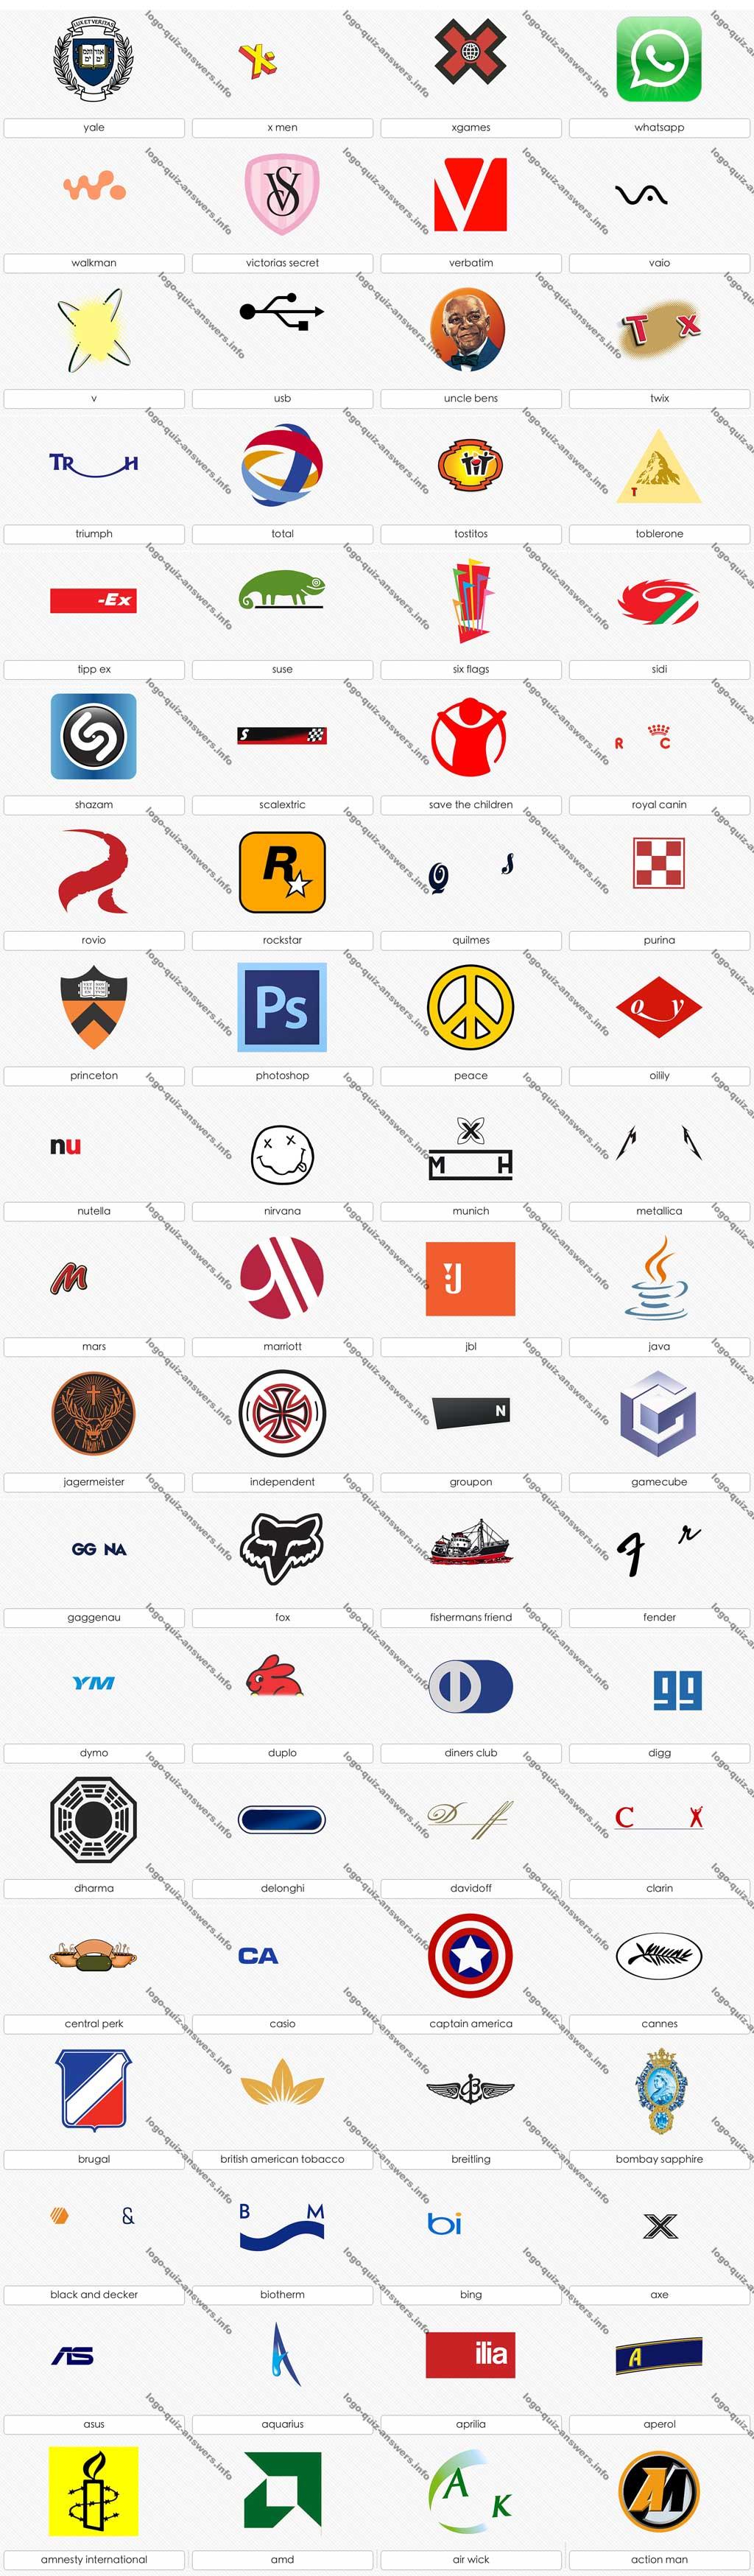 Logo quiz answer level 11 Video games I play Pinterest